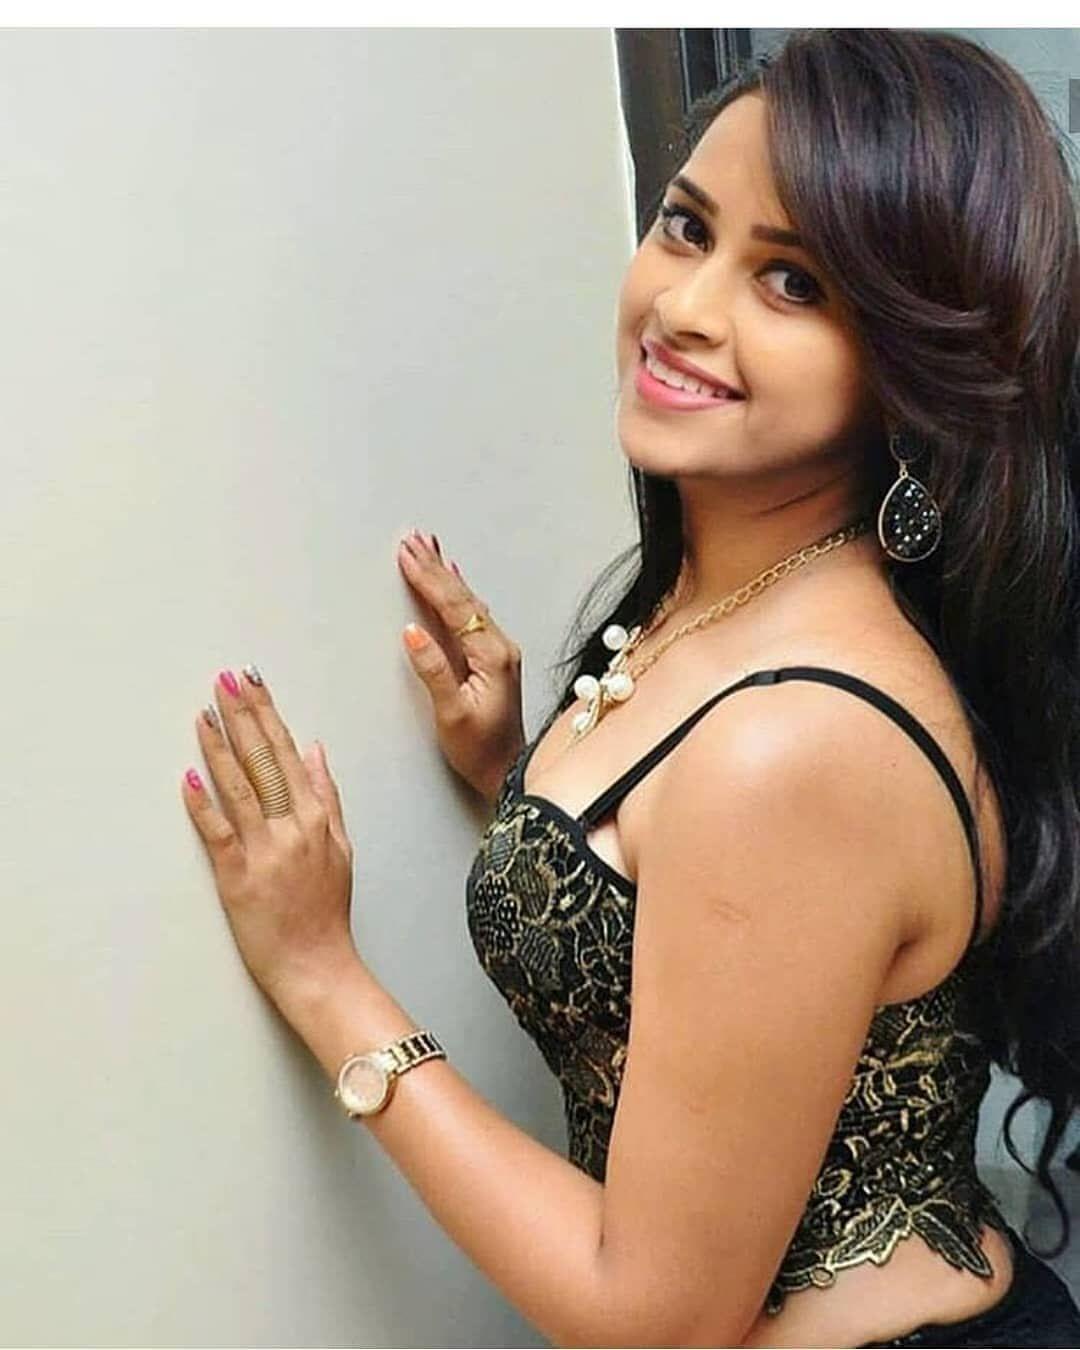 Sridivya 💕 . | Model, Cute beauty, Fashion tips for women